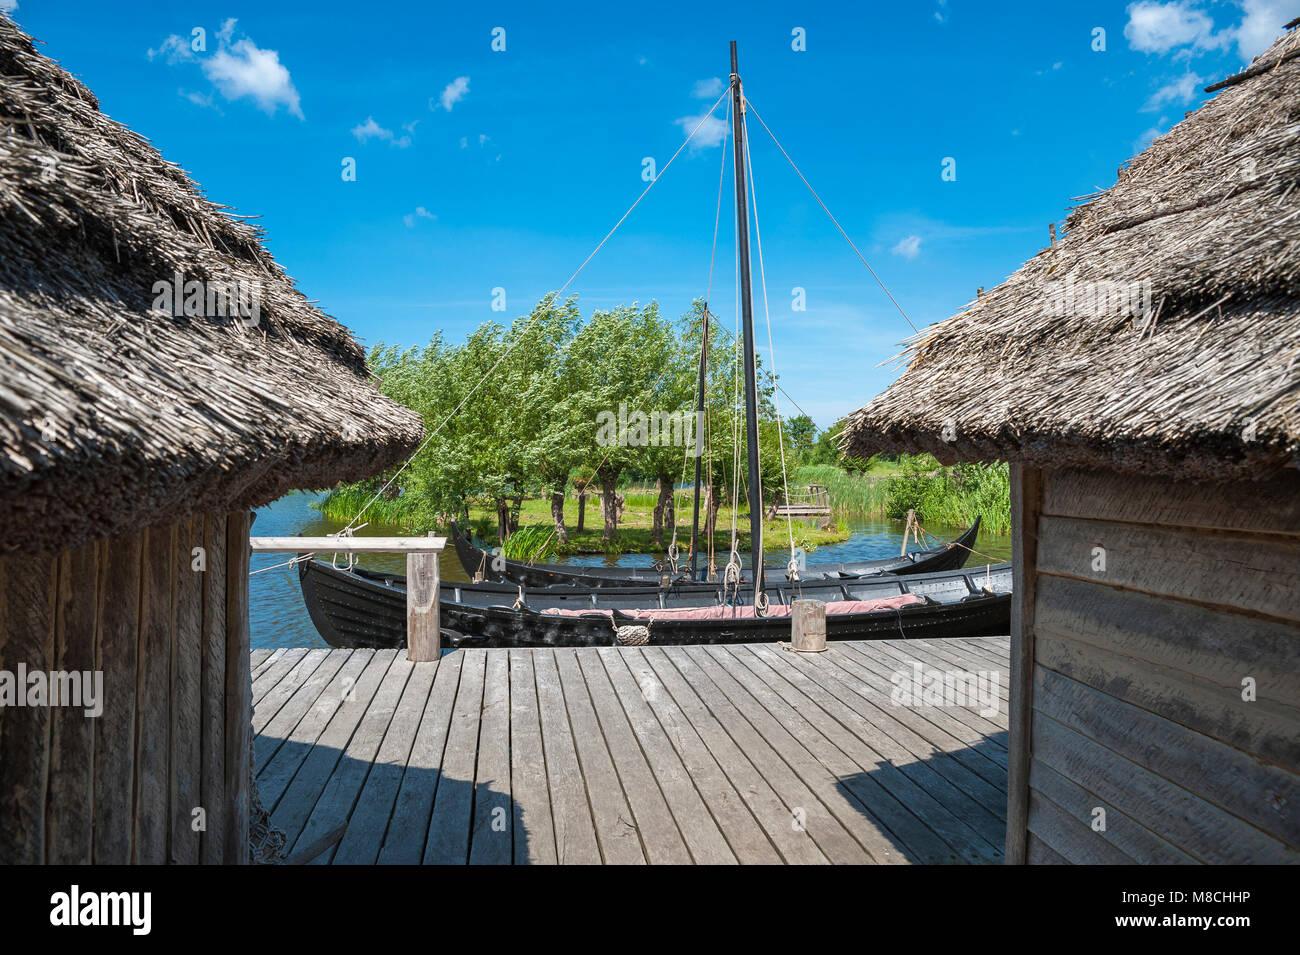 Wallmuseum, slavic village with a viking ship, slavic merchant-ship and dugout, Oldenburg in Holstein, Baltic Sea, - Stock Image